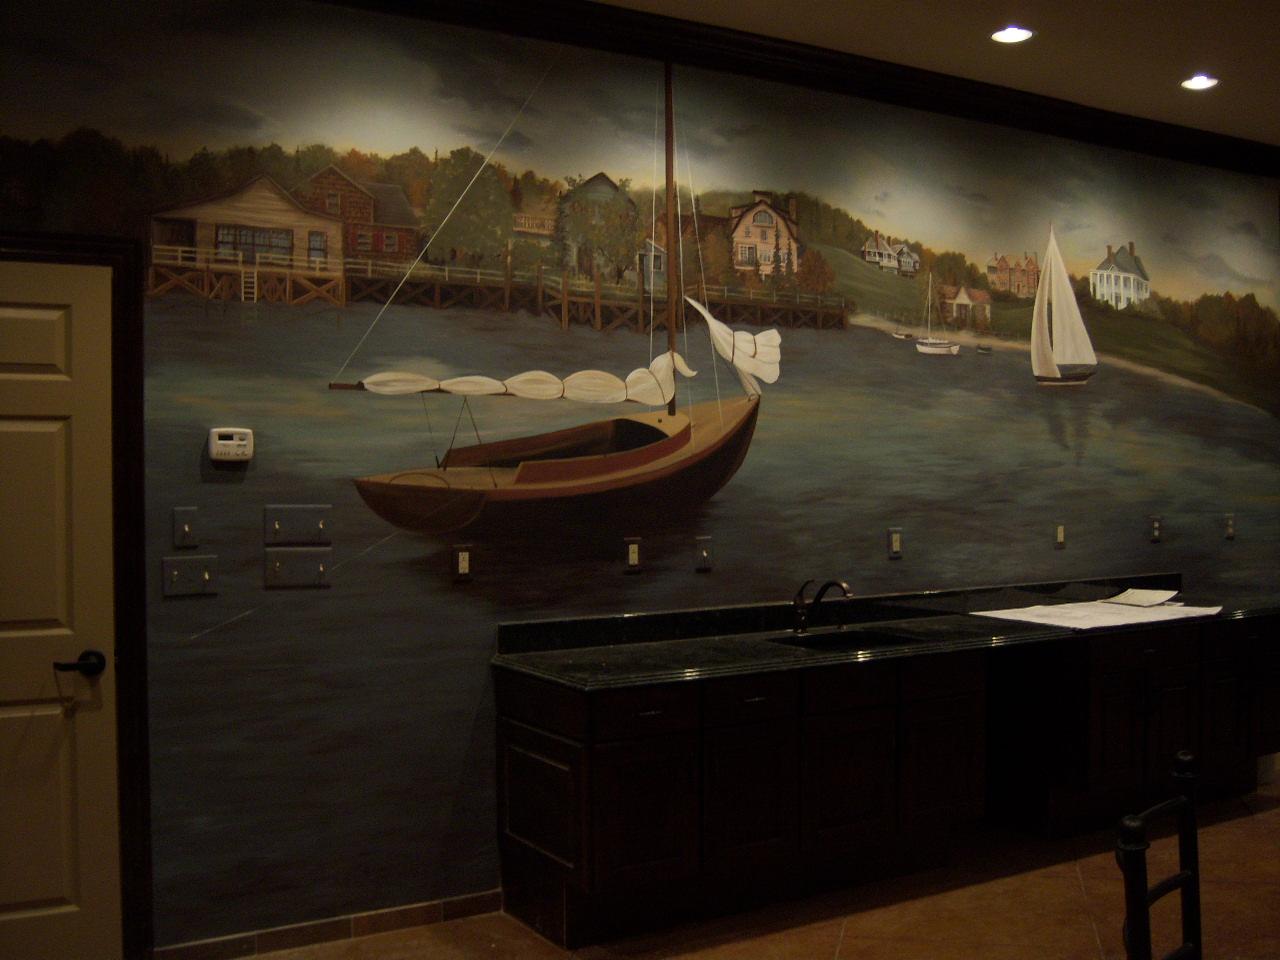 Emerald Bay Community Poolhouse